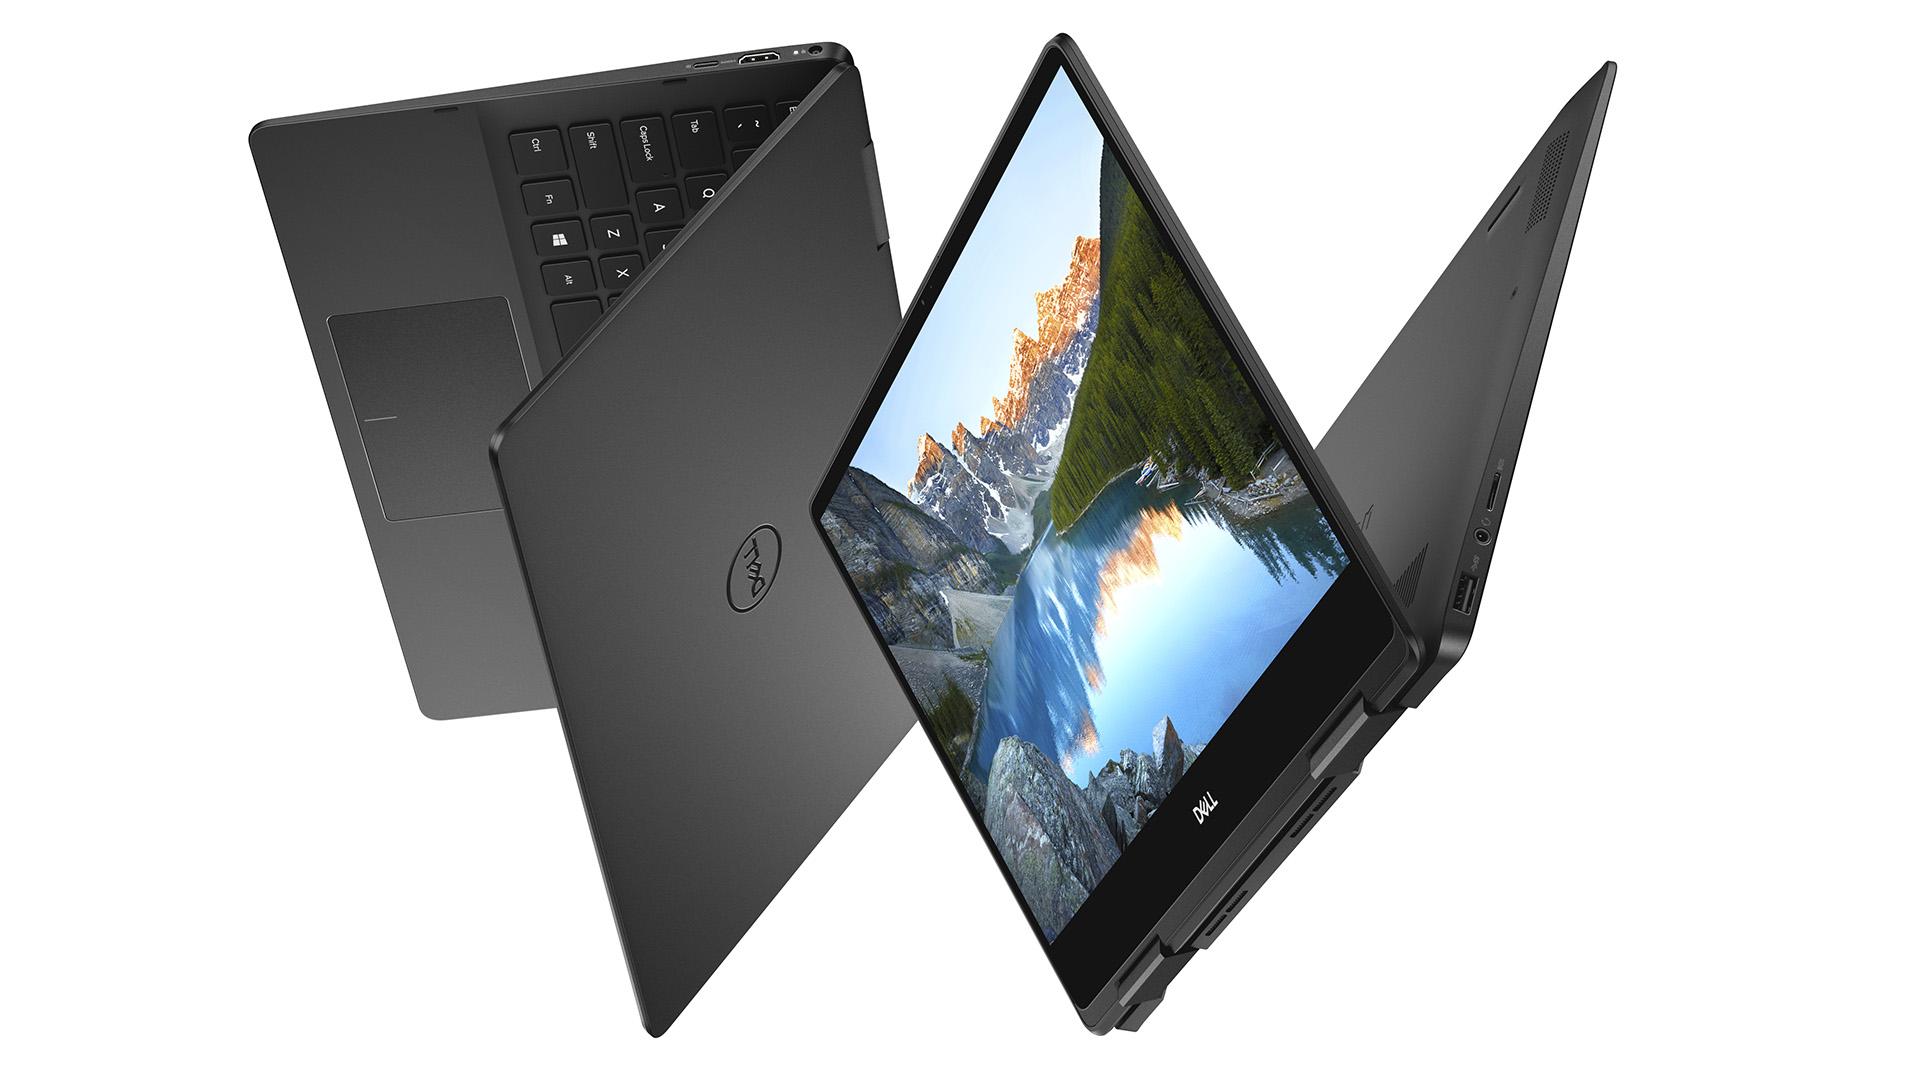 Dell и Alienware на CES 2019: гайд по всем основным новинкам / Блог